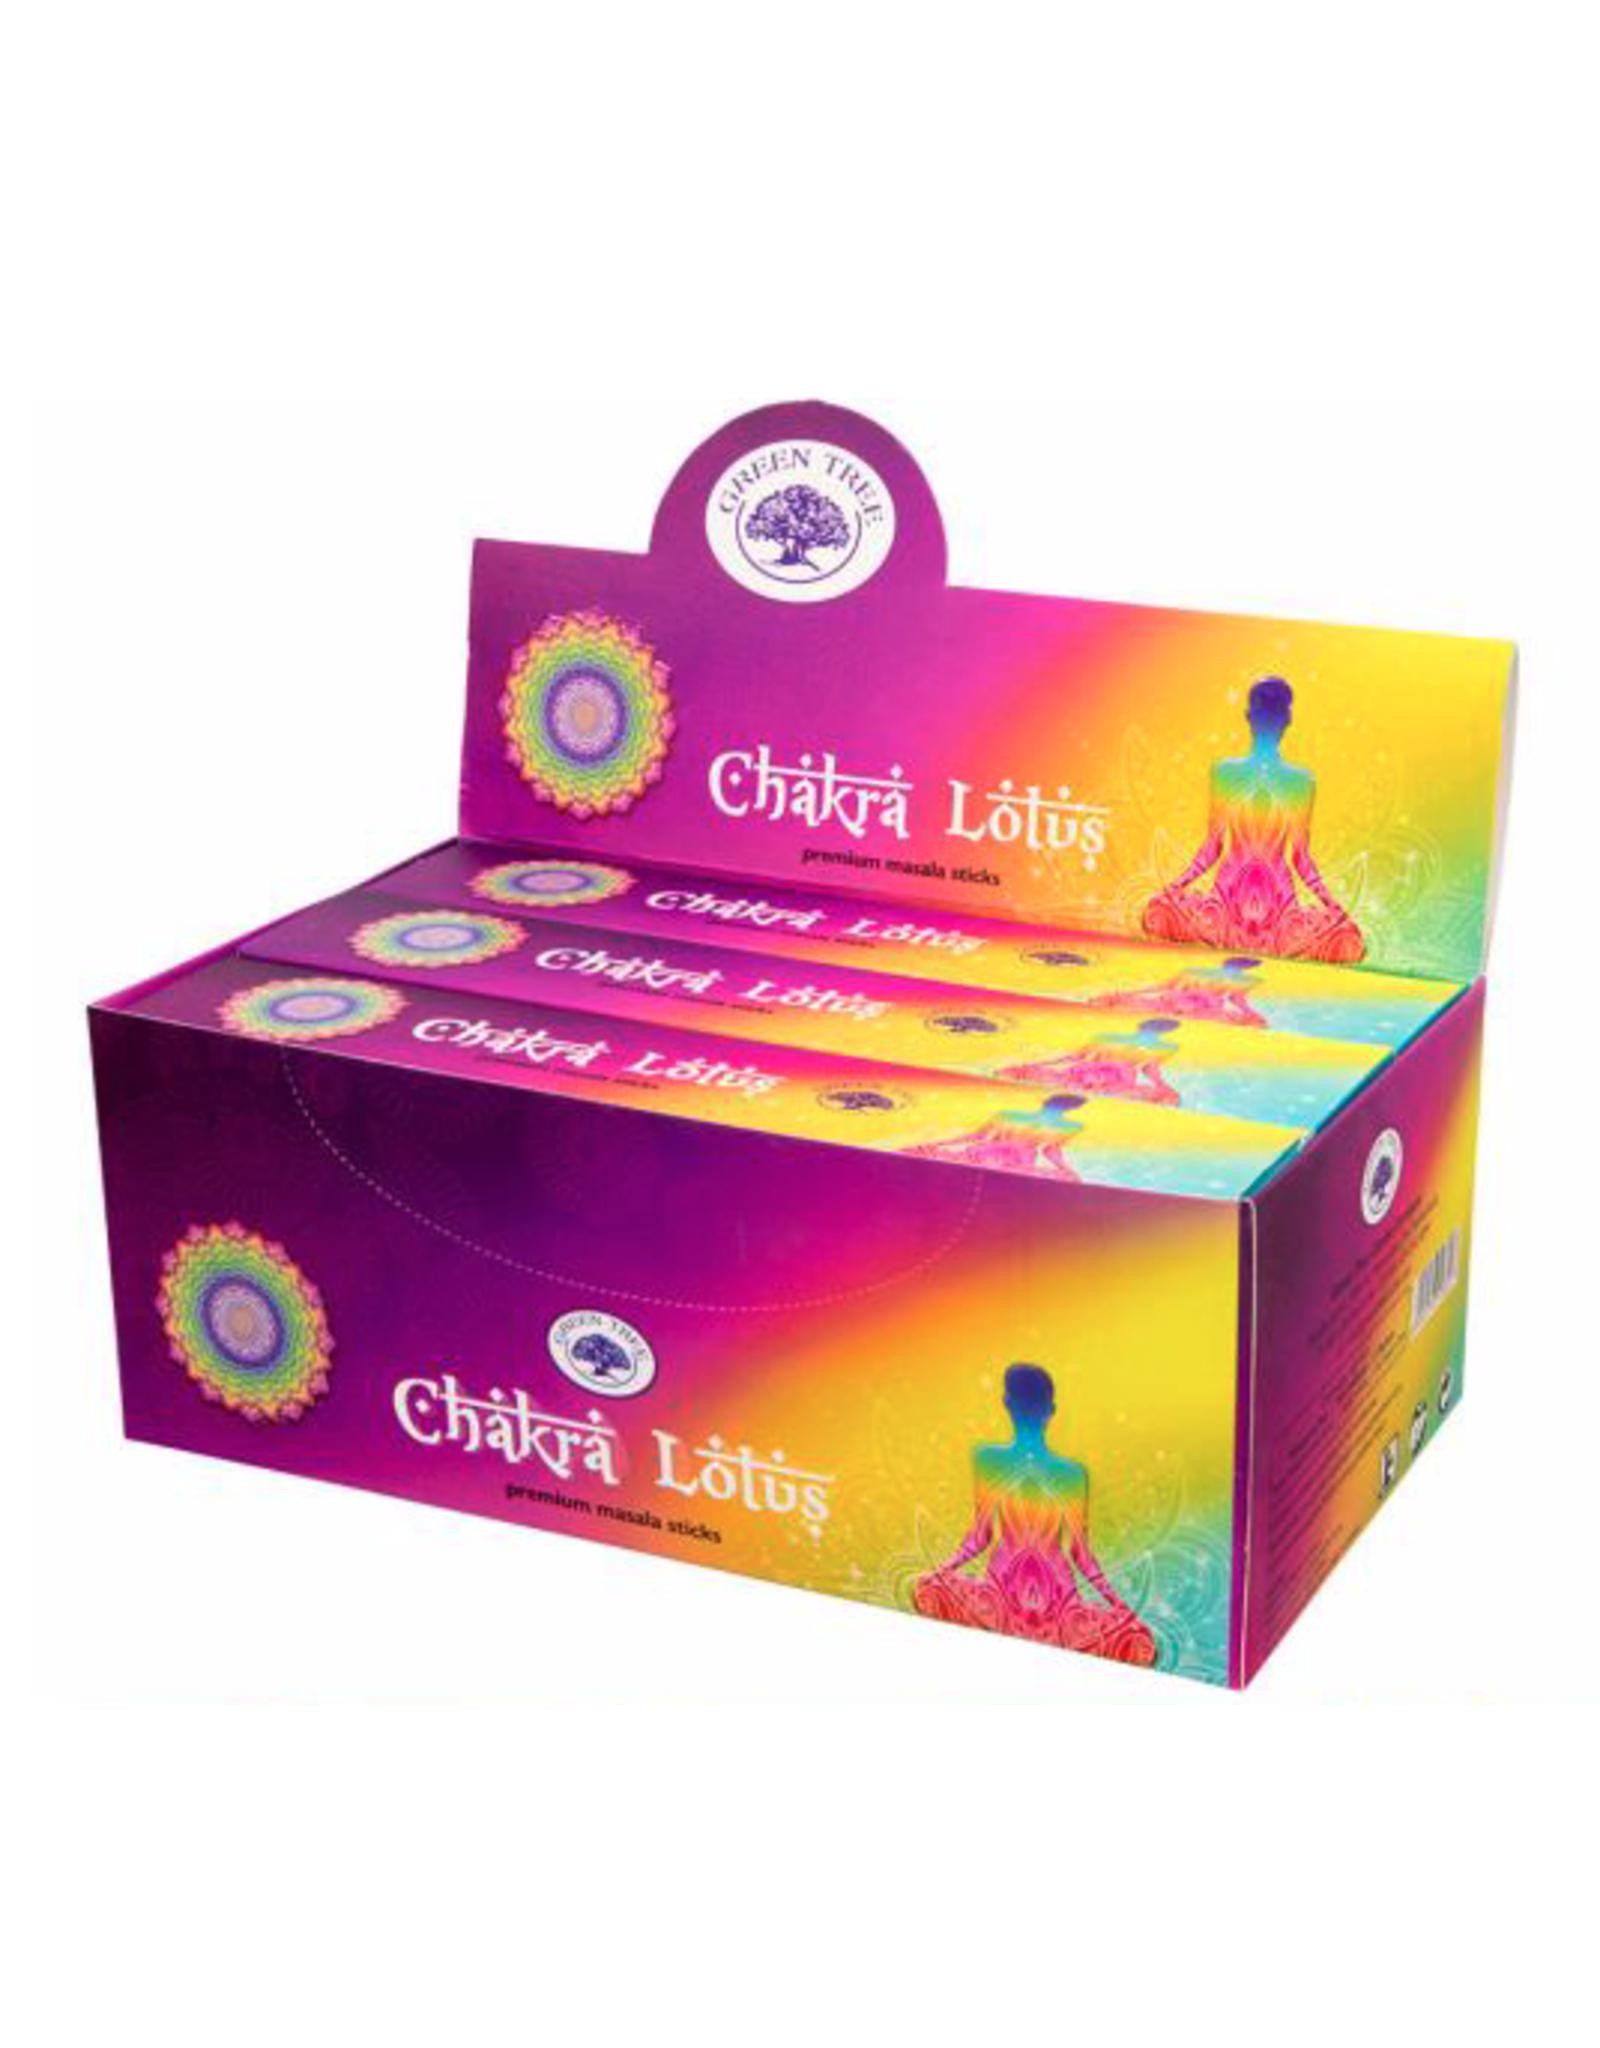 Chakra Lotus Incense Box - Sticks